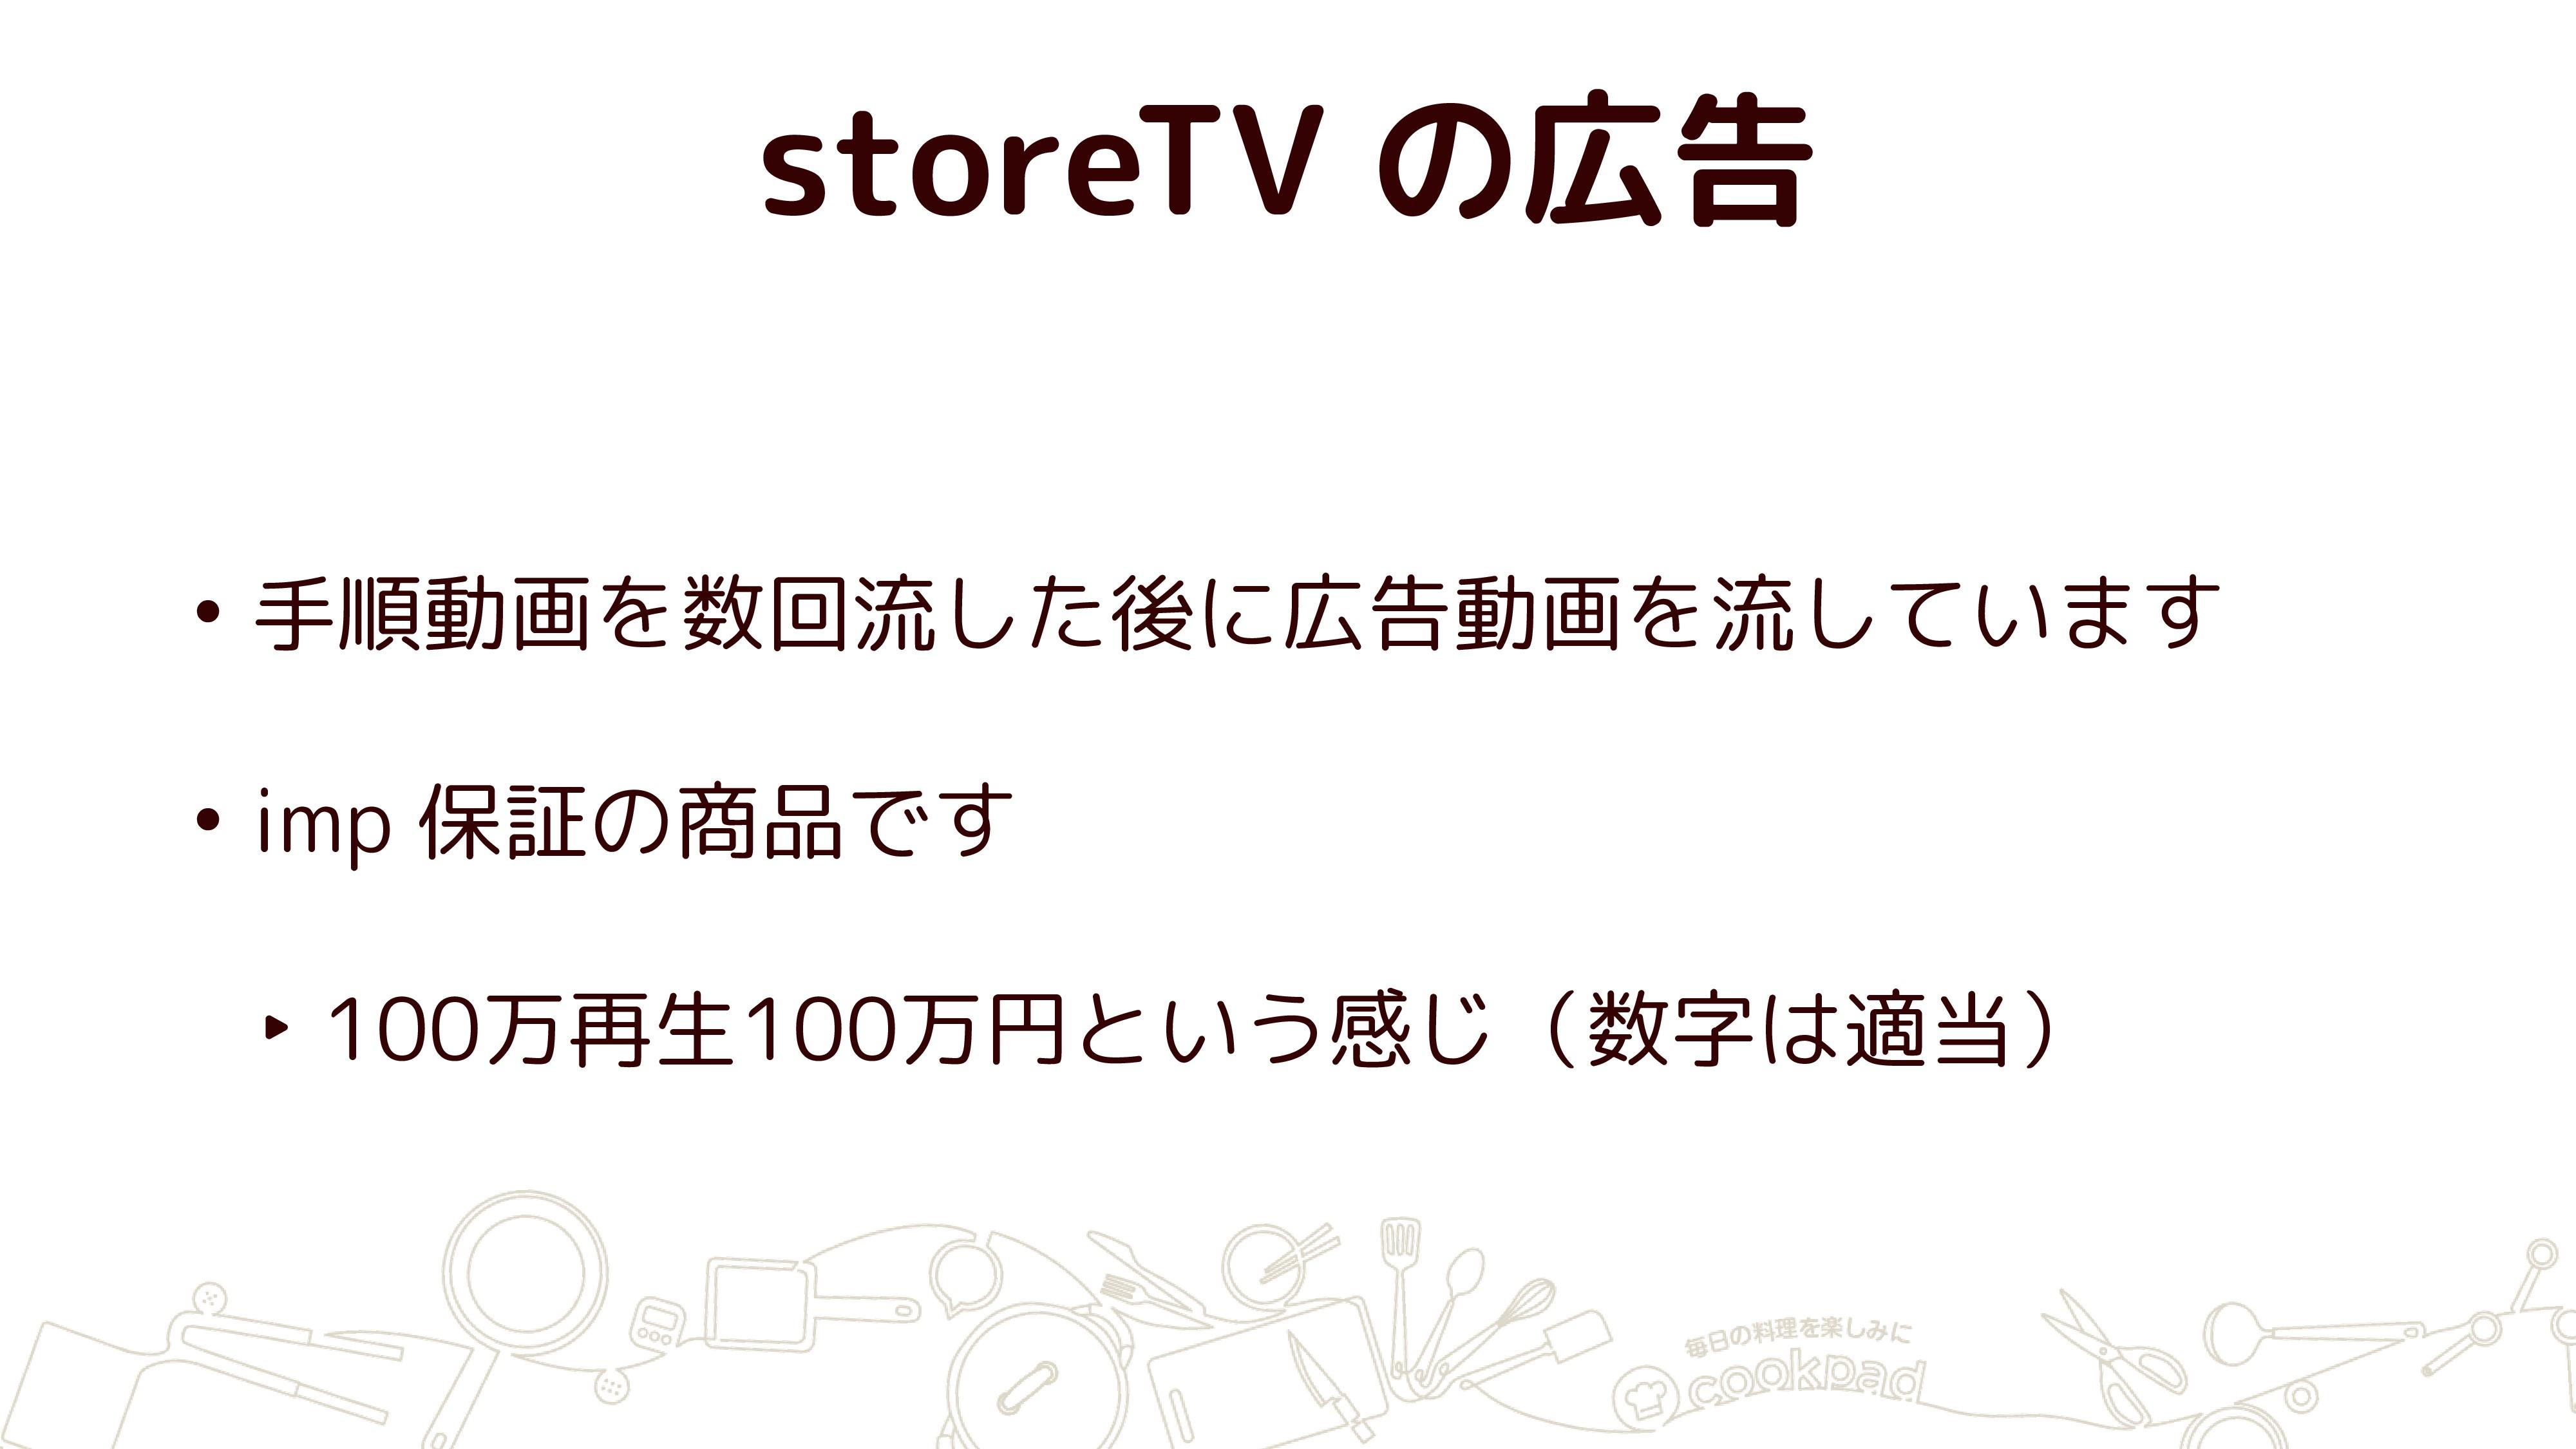 storeTV の広告 • 手順動画を数回流した後に広告動画を流しています • imp 保証の...